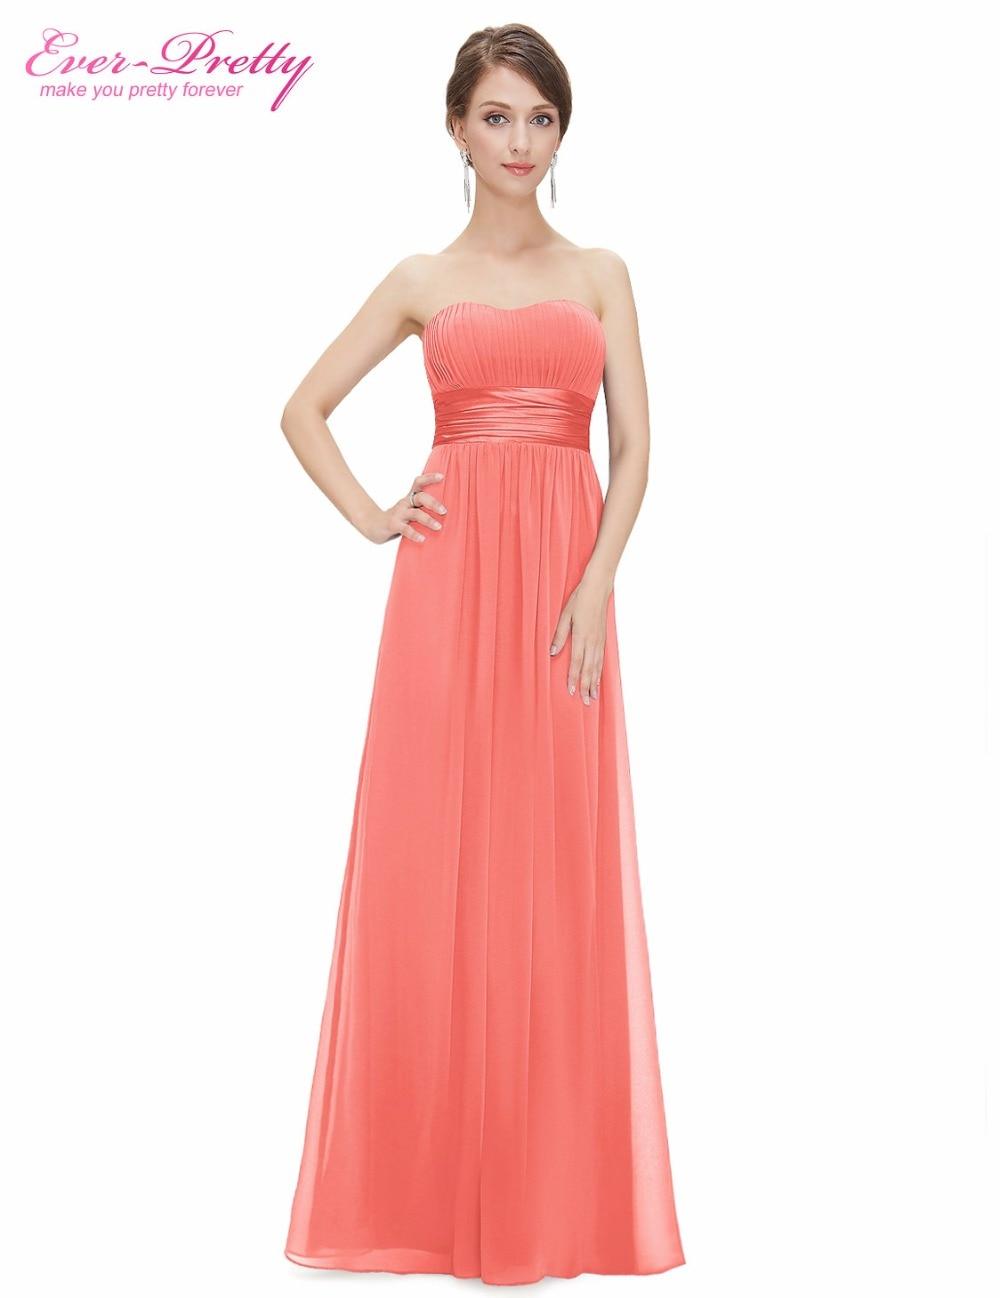 Strapless bridesmaid dresses reviews online shopping for Aliexpress wedding dress reviews